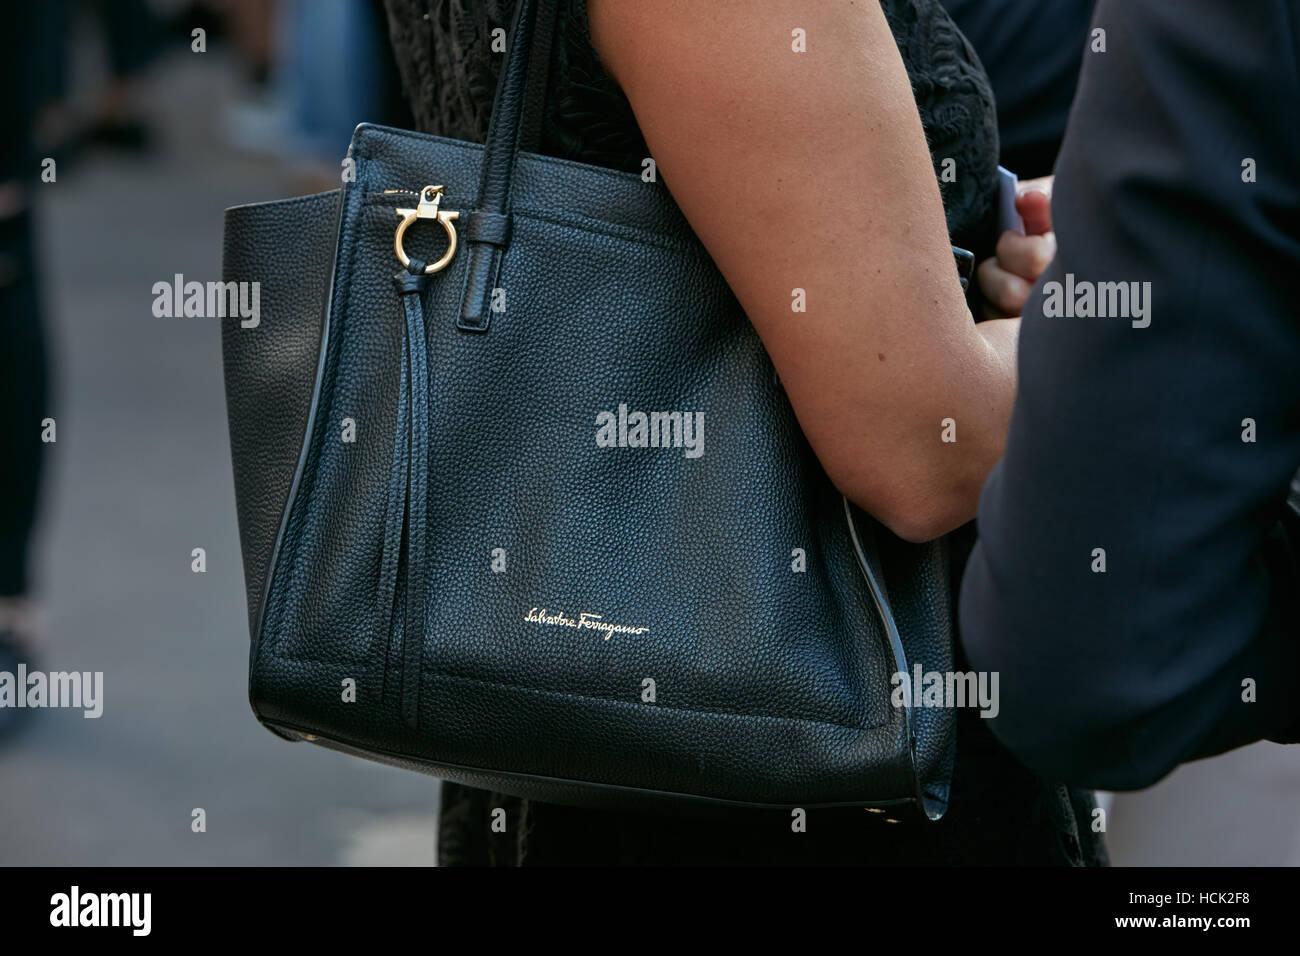 Woman with black leather Salvatore Ferragamo bag before Salvatore Ferragamo fashion show, Milan Fashion Week street - Stock Image